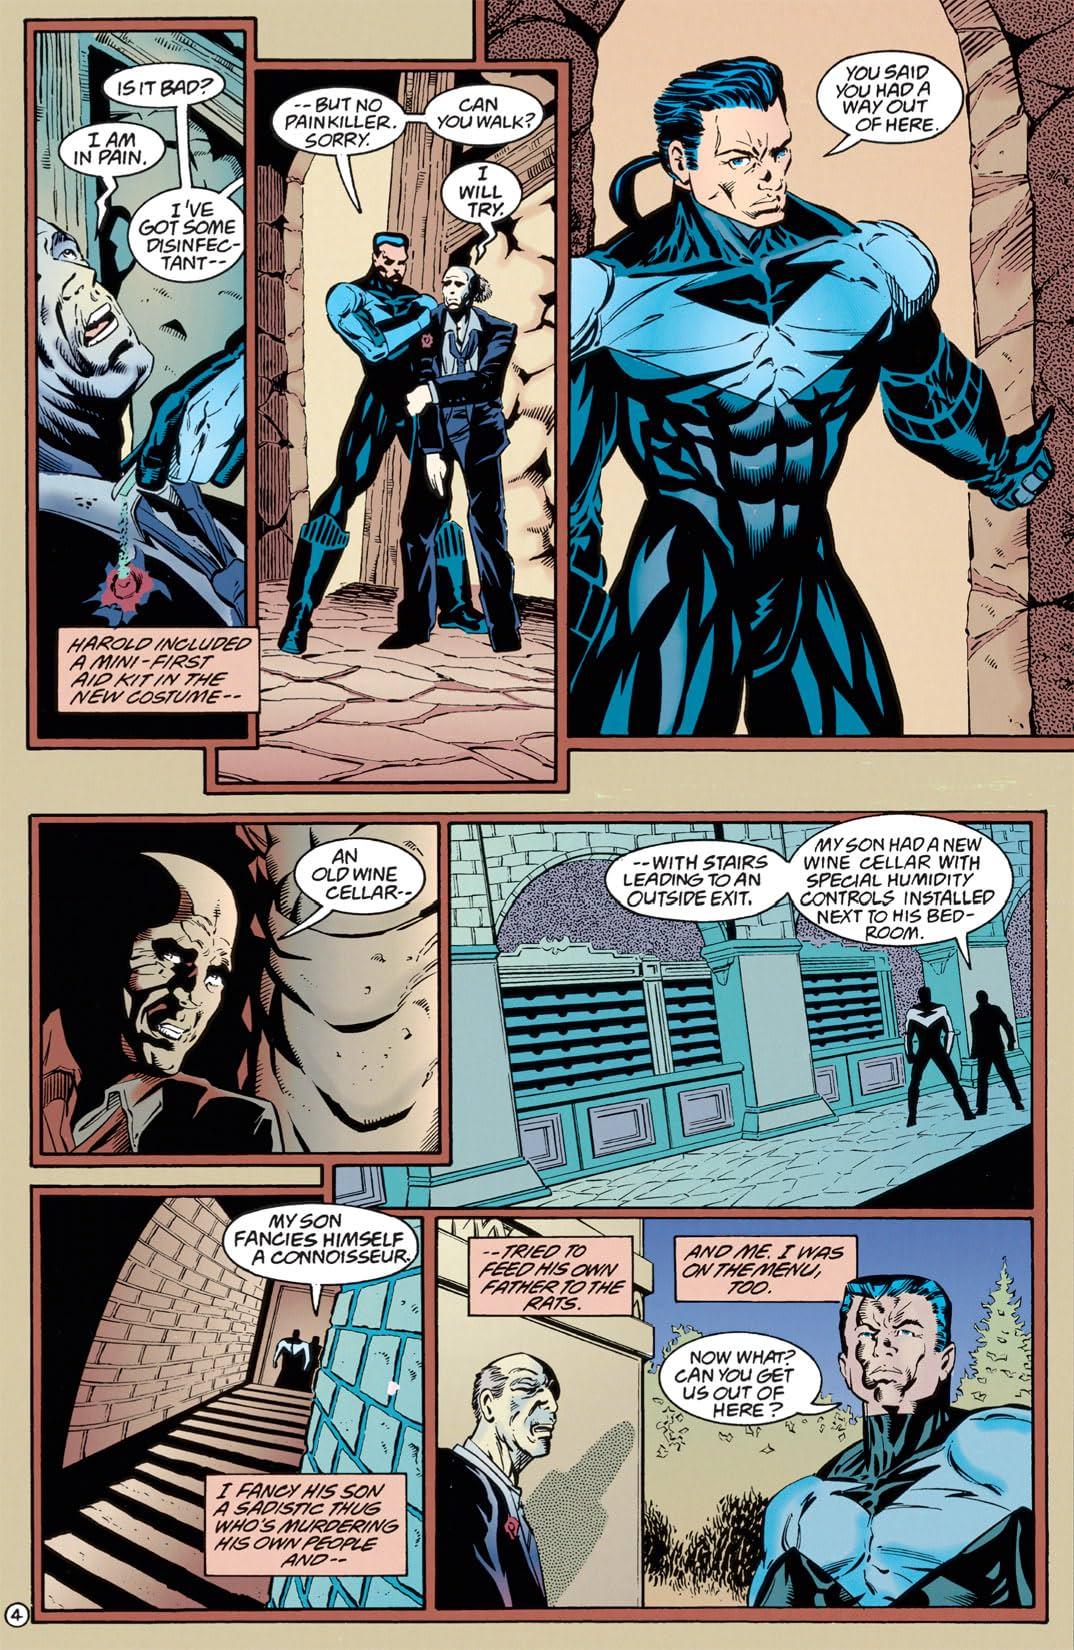 Nightwing (1995) #4 (of 4)